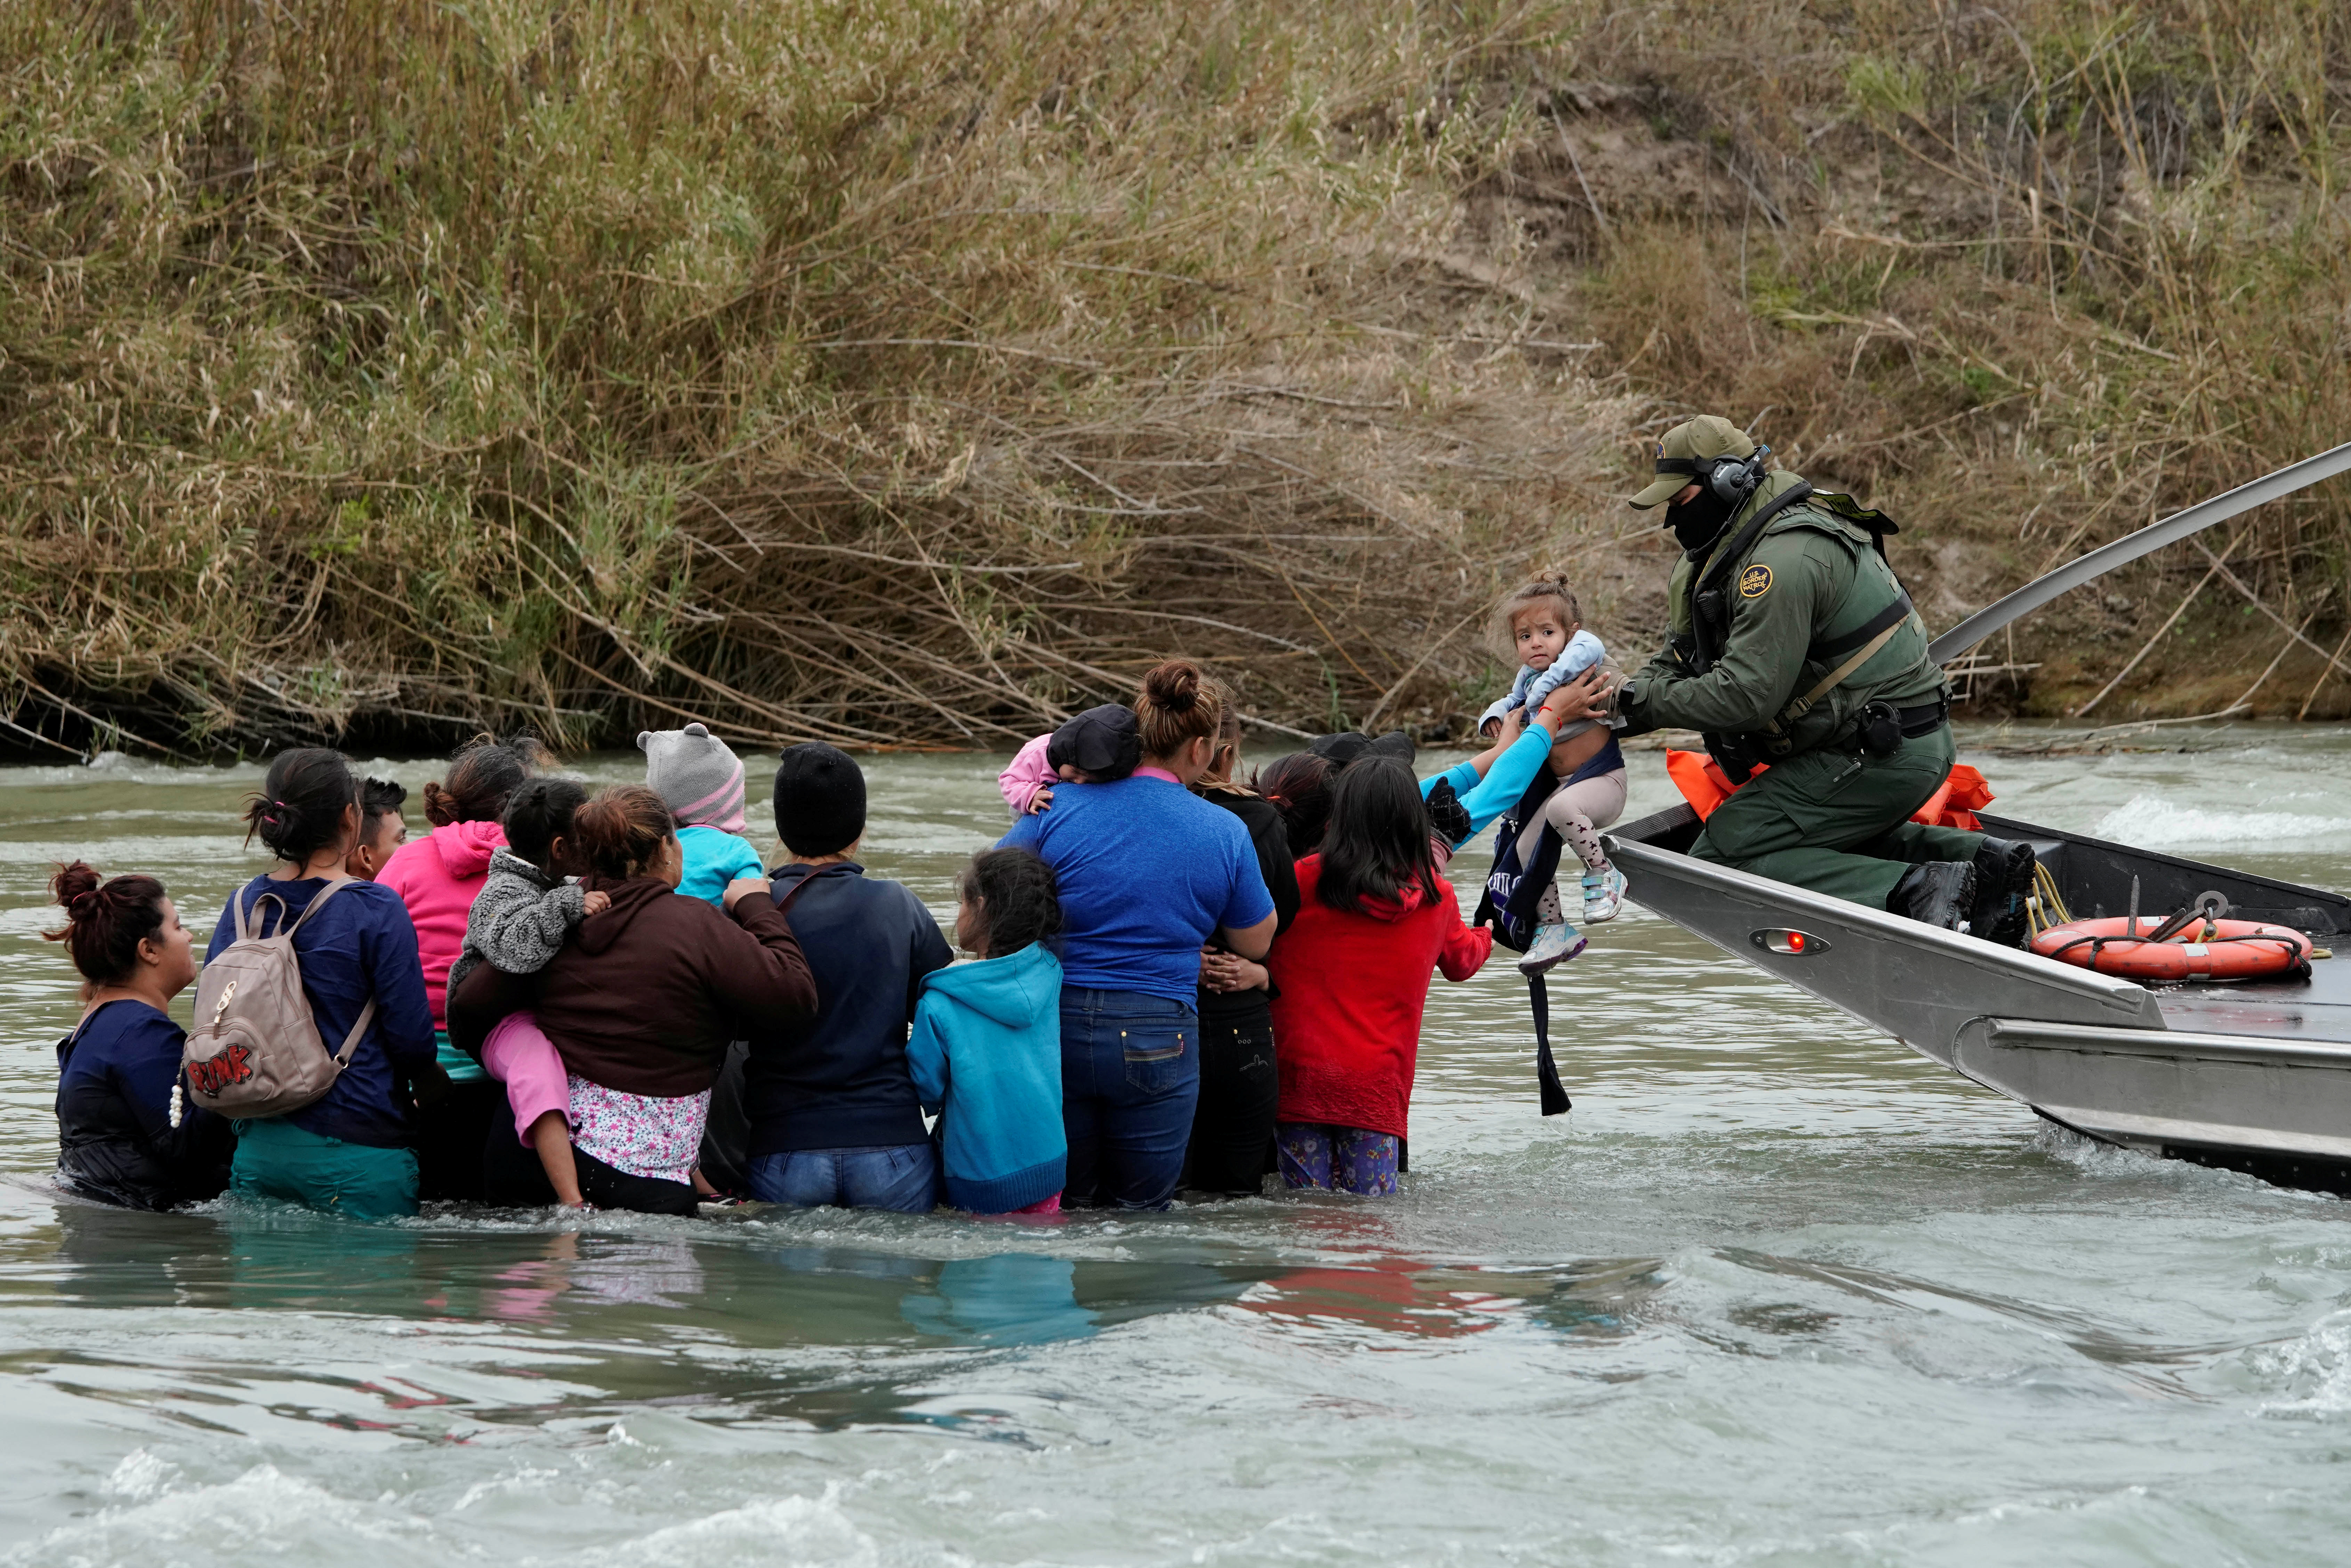 A U.S. border patrol agent rescues migrants crossing the Rio Bravo towards the United States, in Piedras Negras